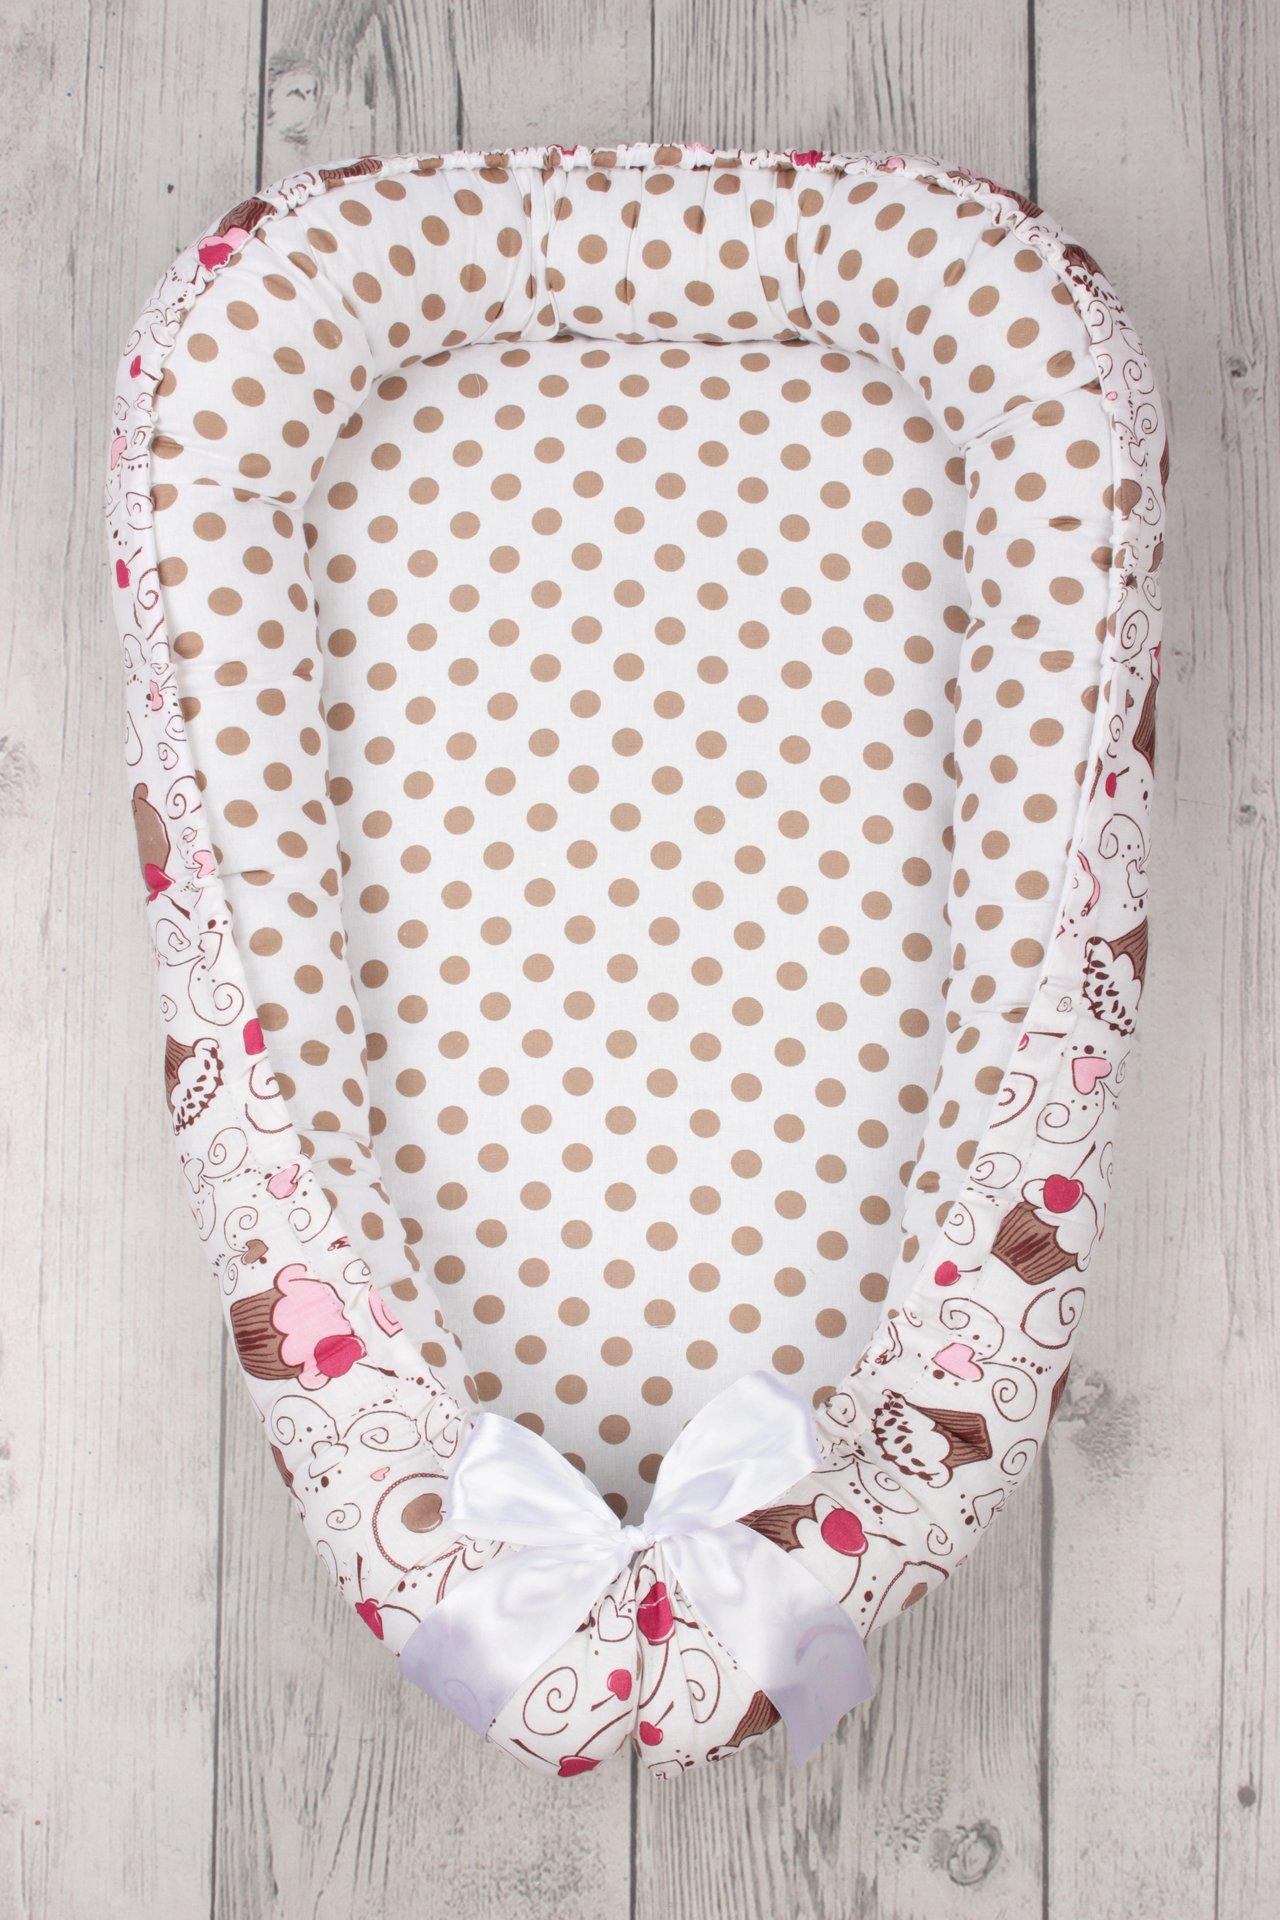 фото подушки-позиционера для сна AmaroBaby кокон-гнездышко, LITTLE BABY в цвете Соня